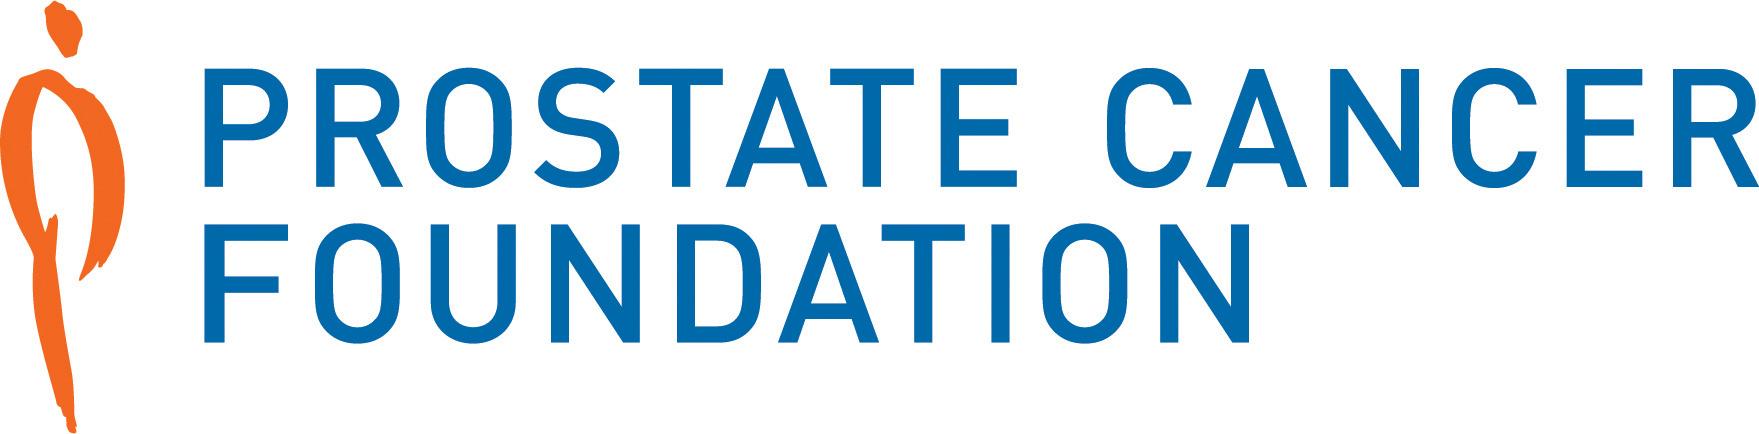 City hope prostate cancer trials